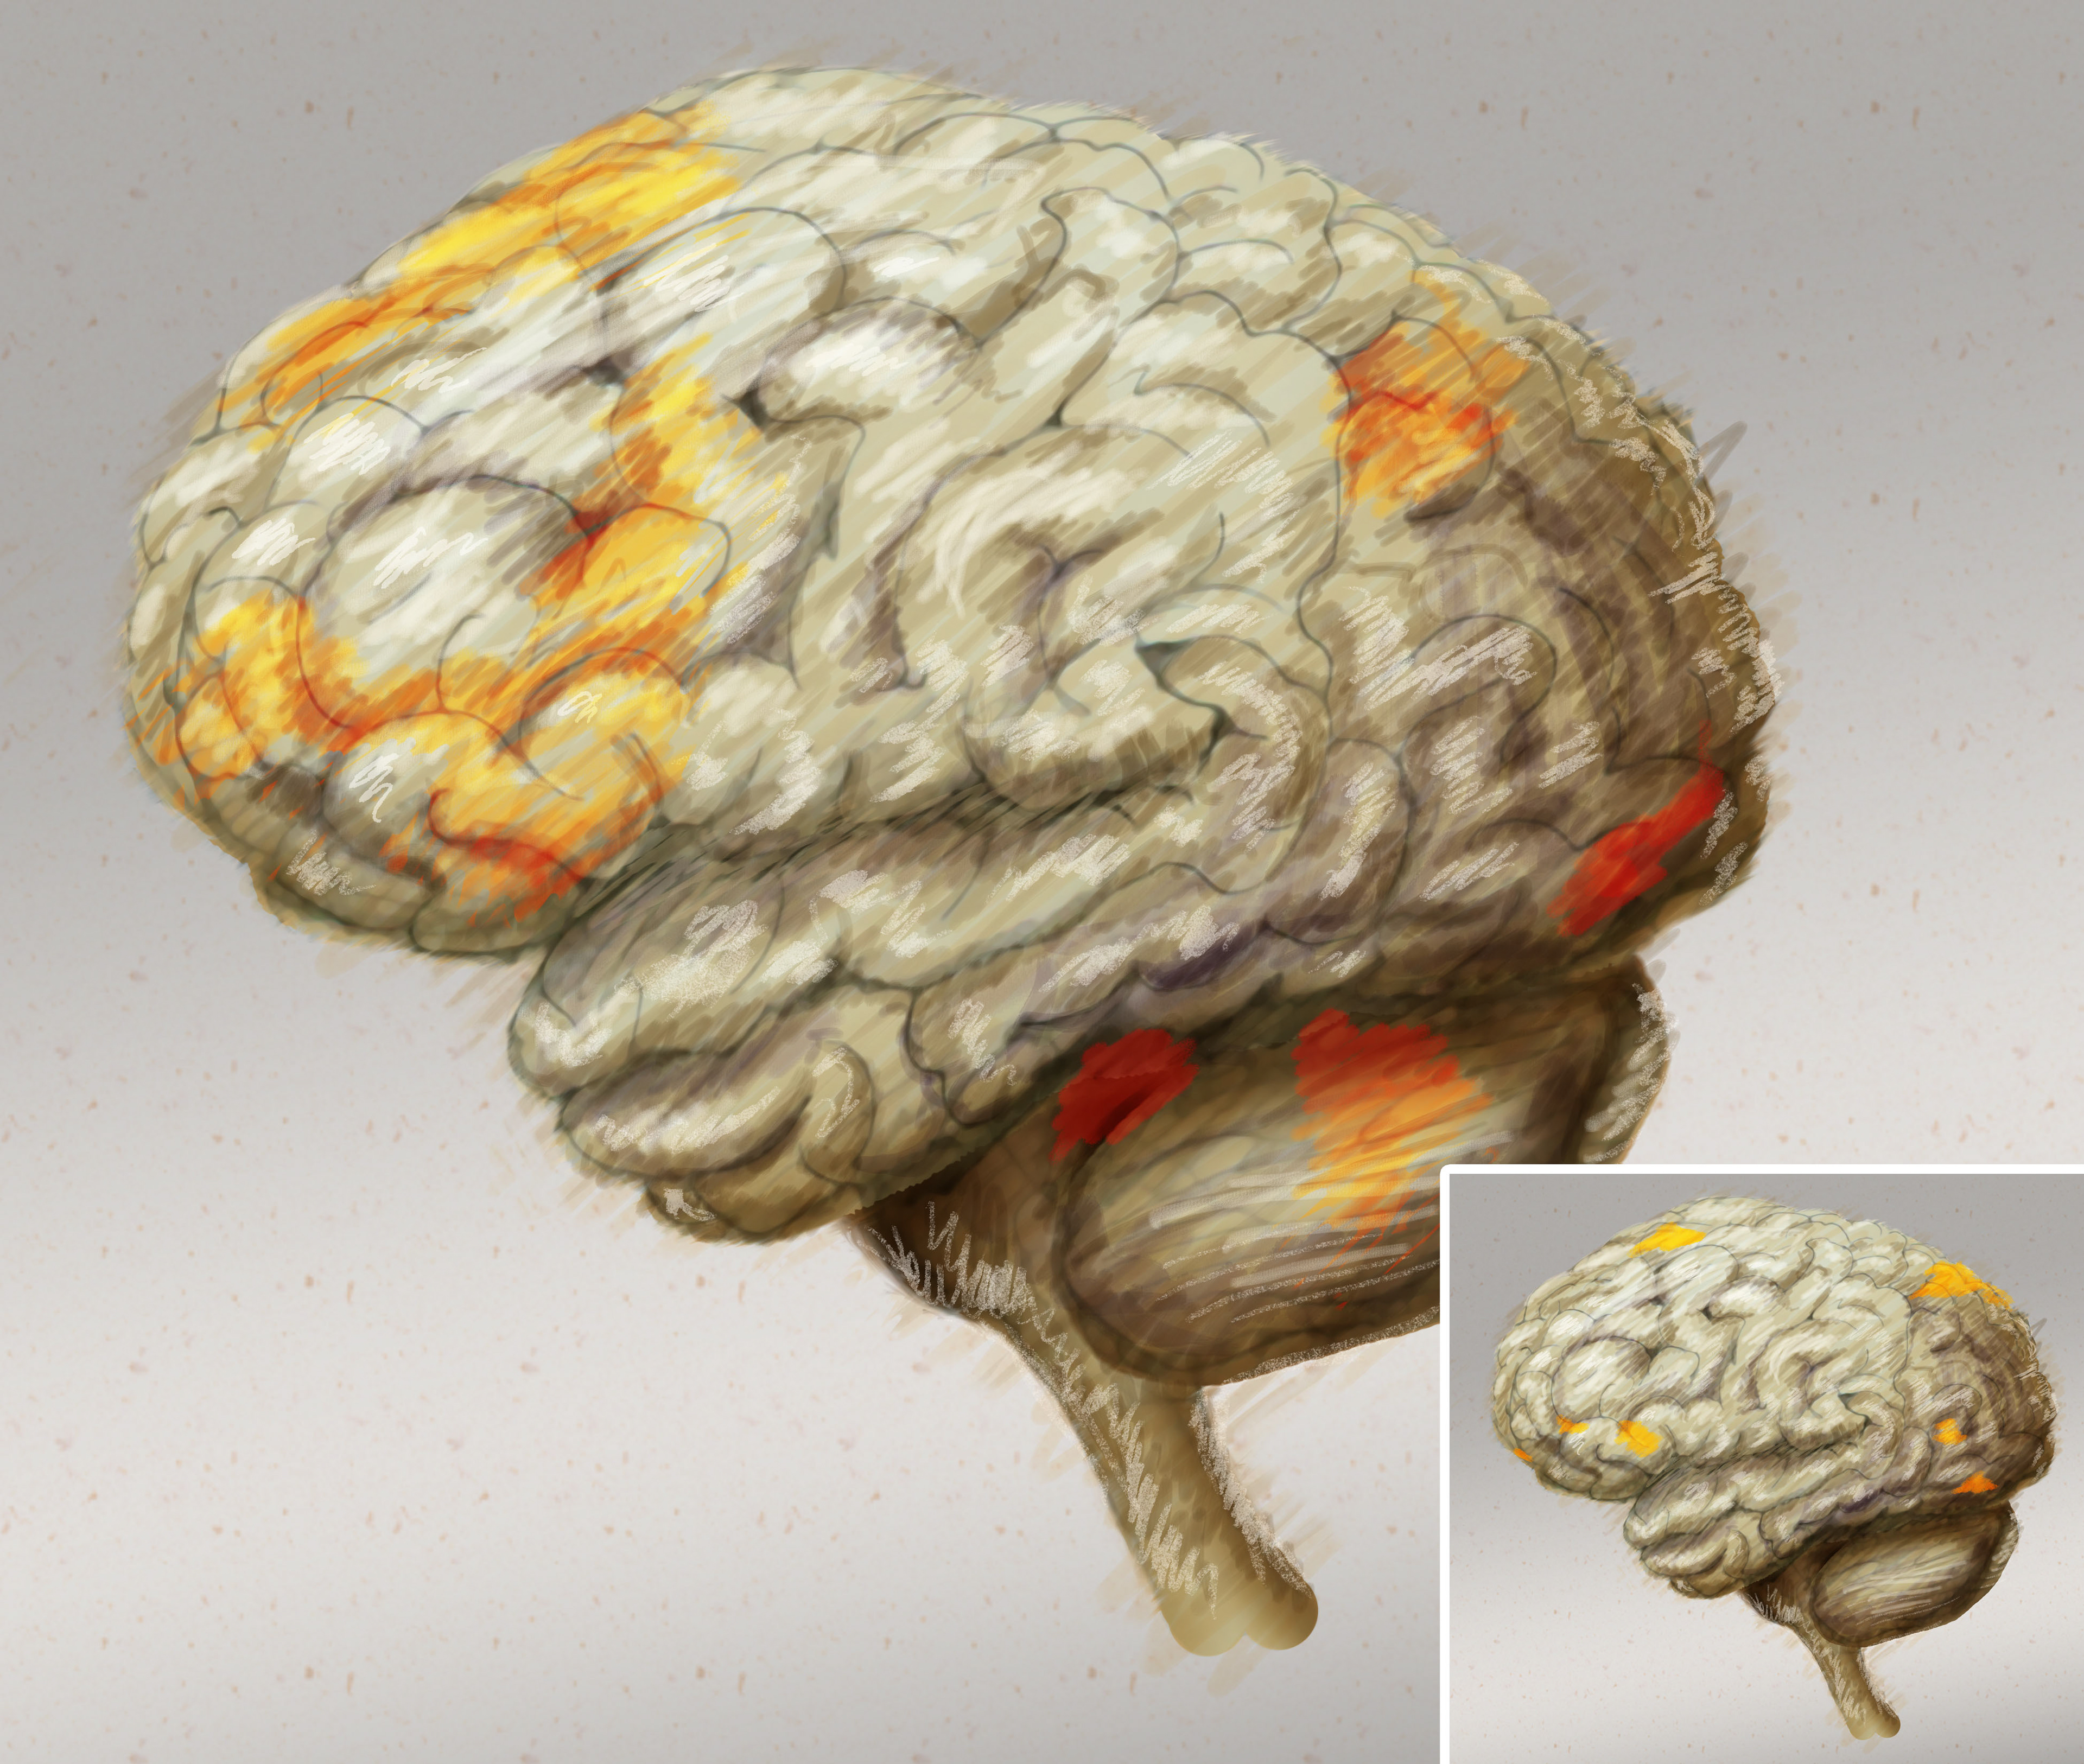 Drawn brains normal R tasks normal certain undergoing